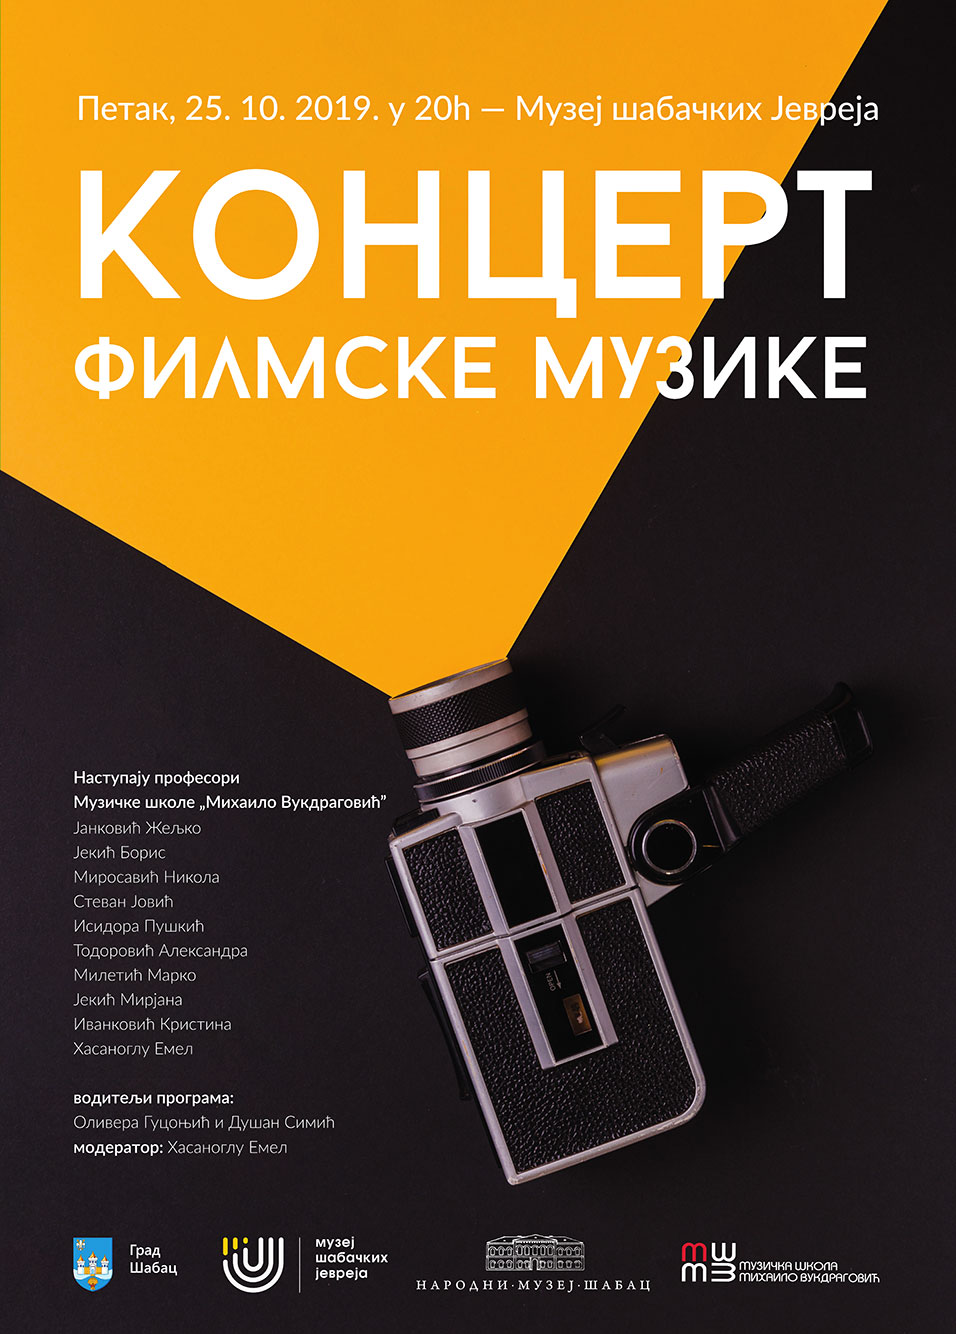 KONCERT-filmske-muzike_001